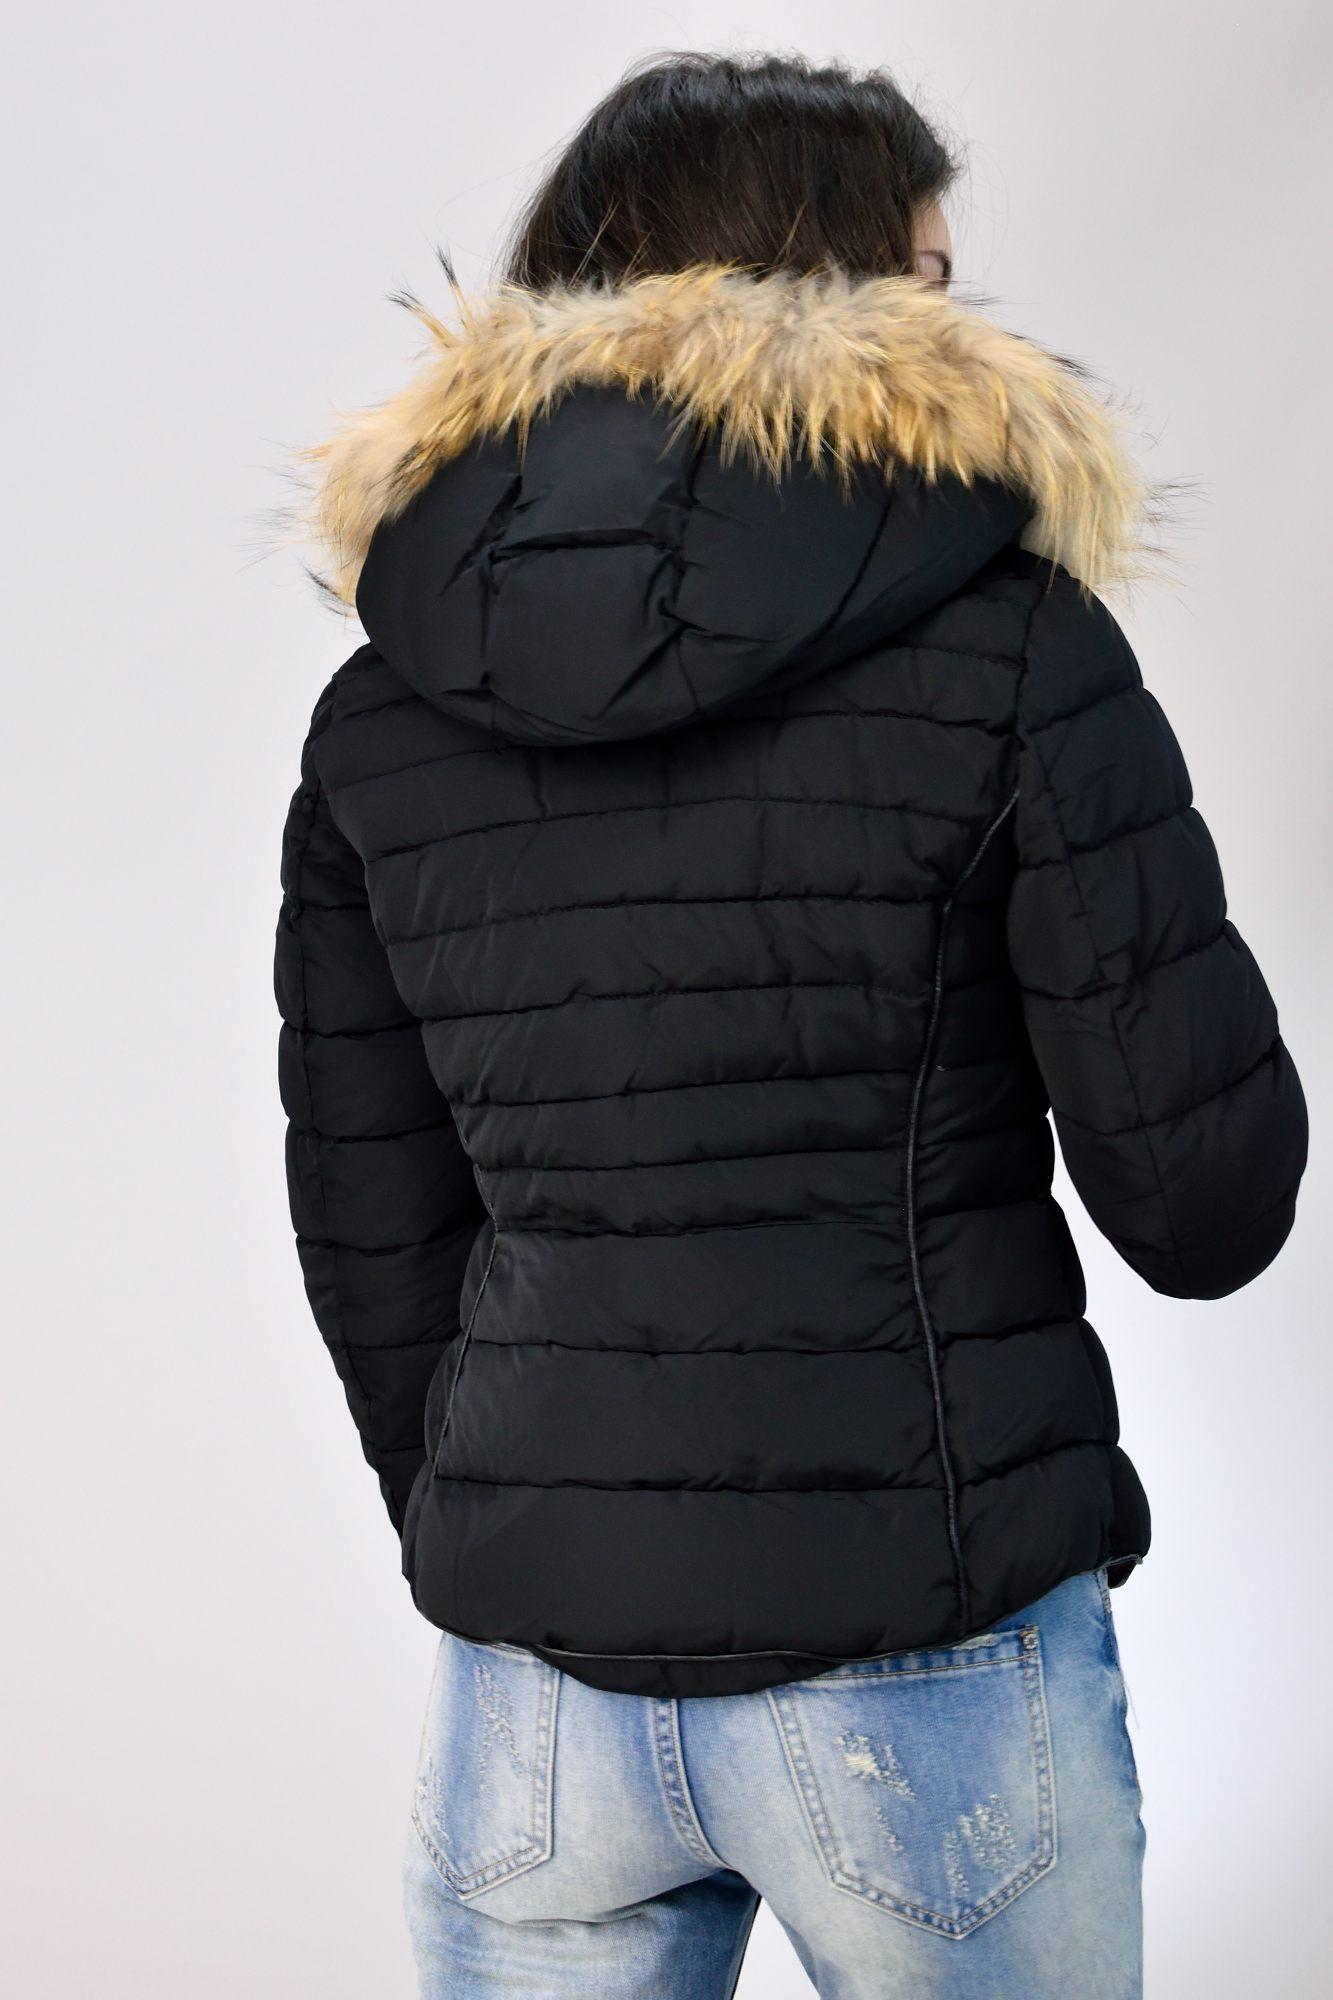 cf262dcd98 Καπιτονέ μπουφάν με κουκούλα μαύρο - Γυναικεία μπουφάν